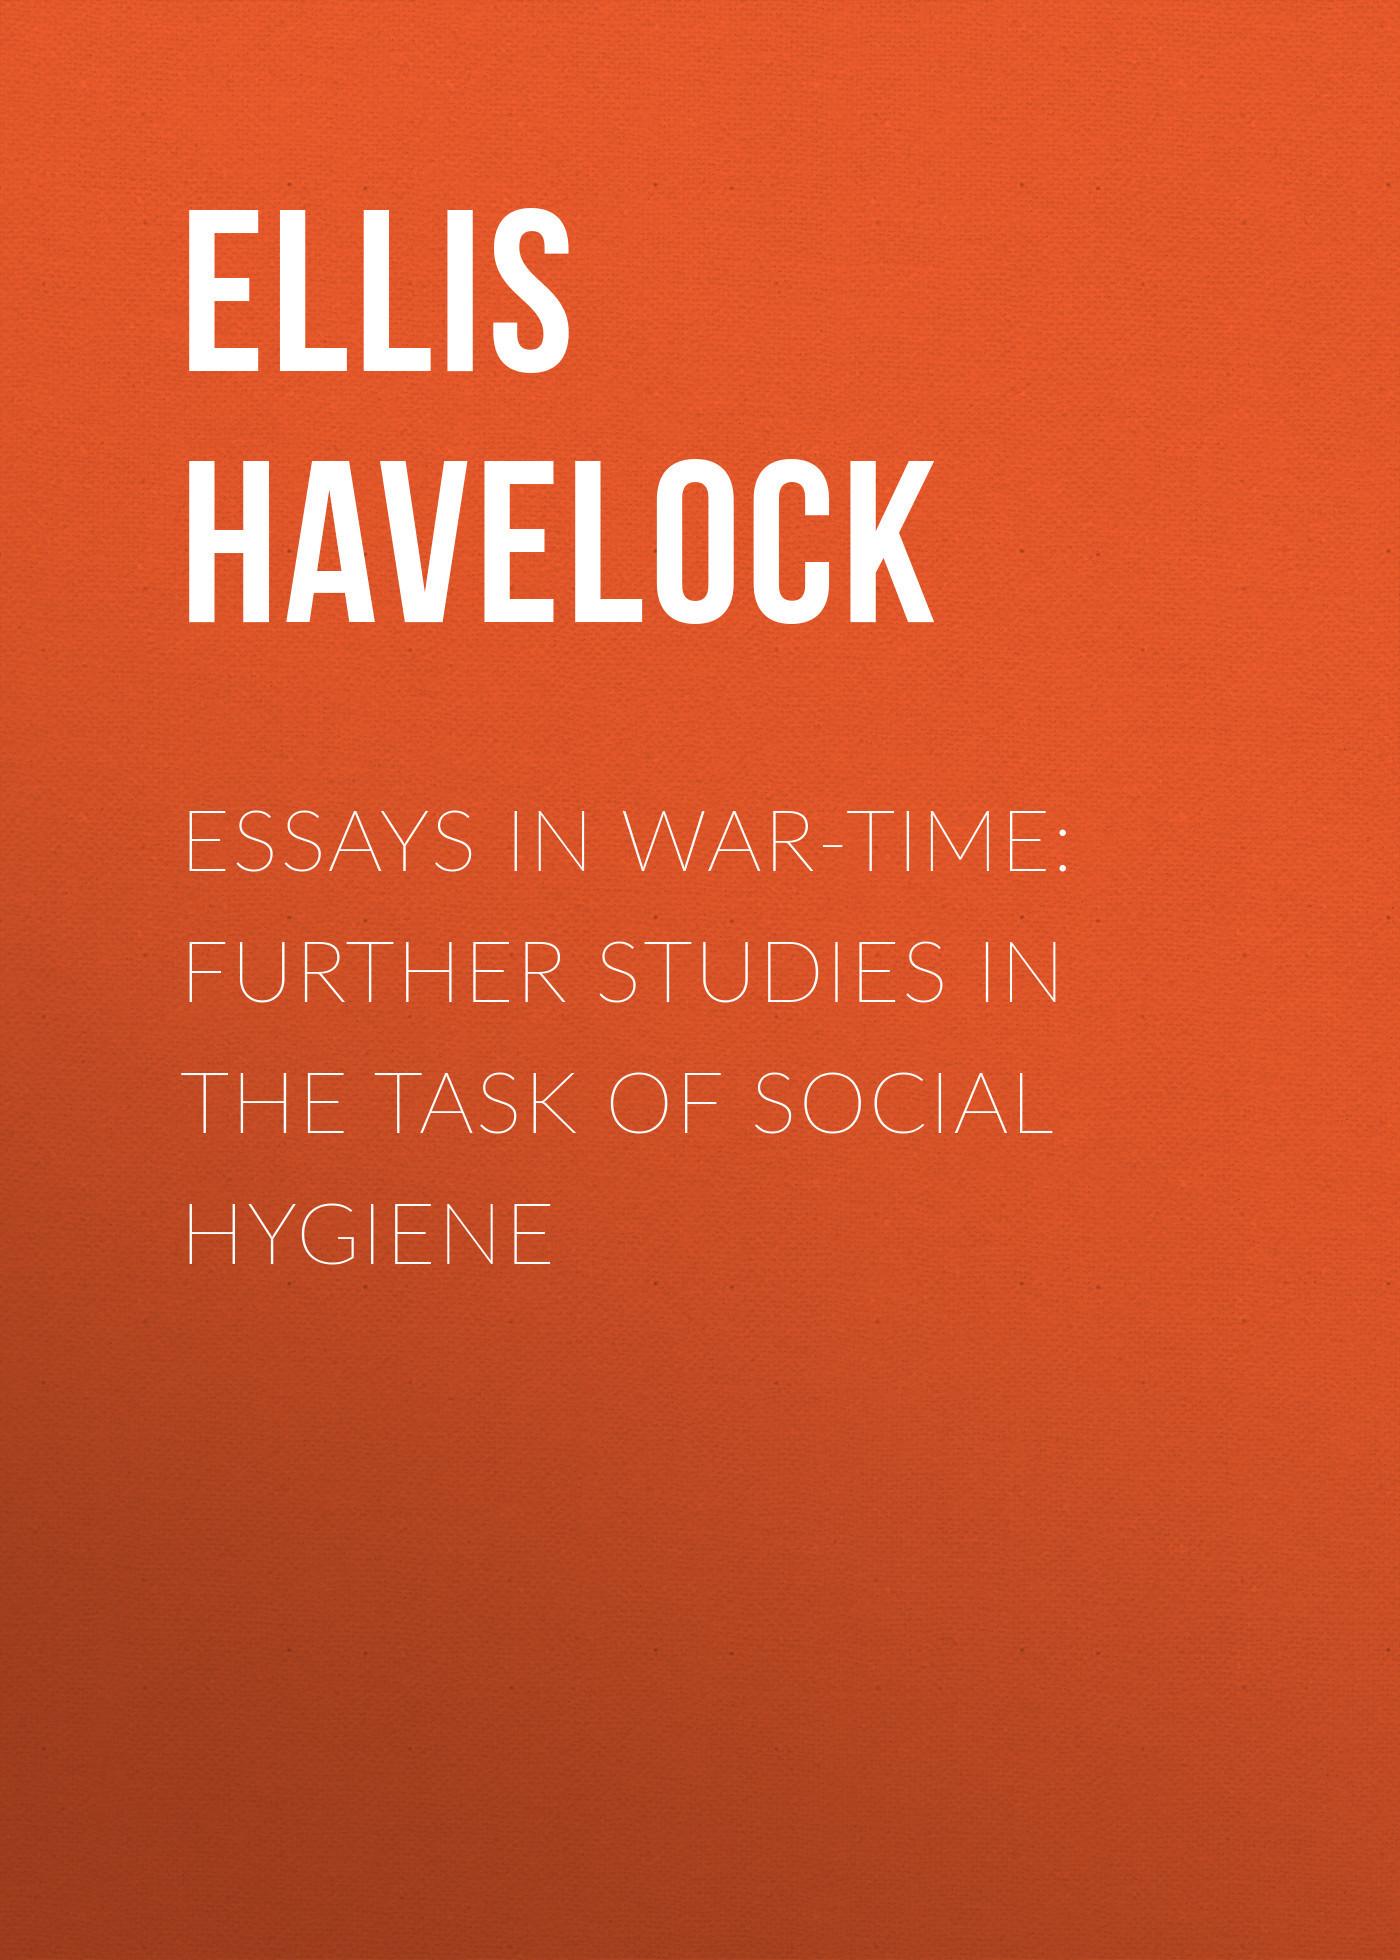 Ellis Havelock Essays in War-Time: Further Studies in the Task of Social Hygiene